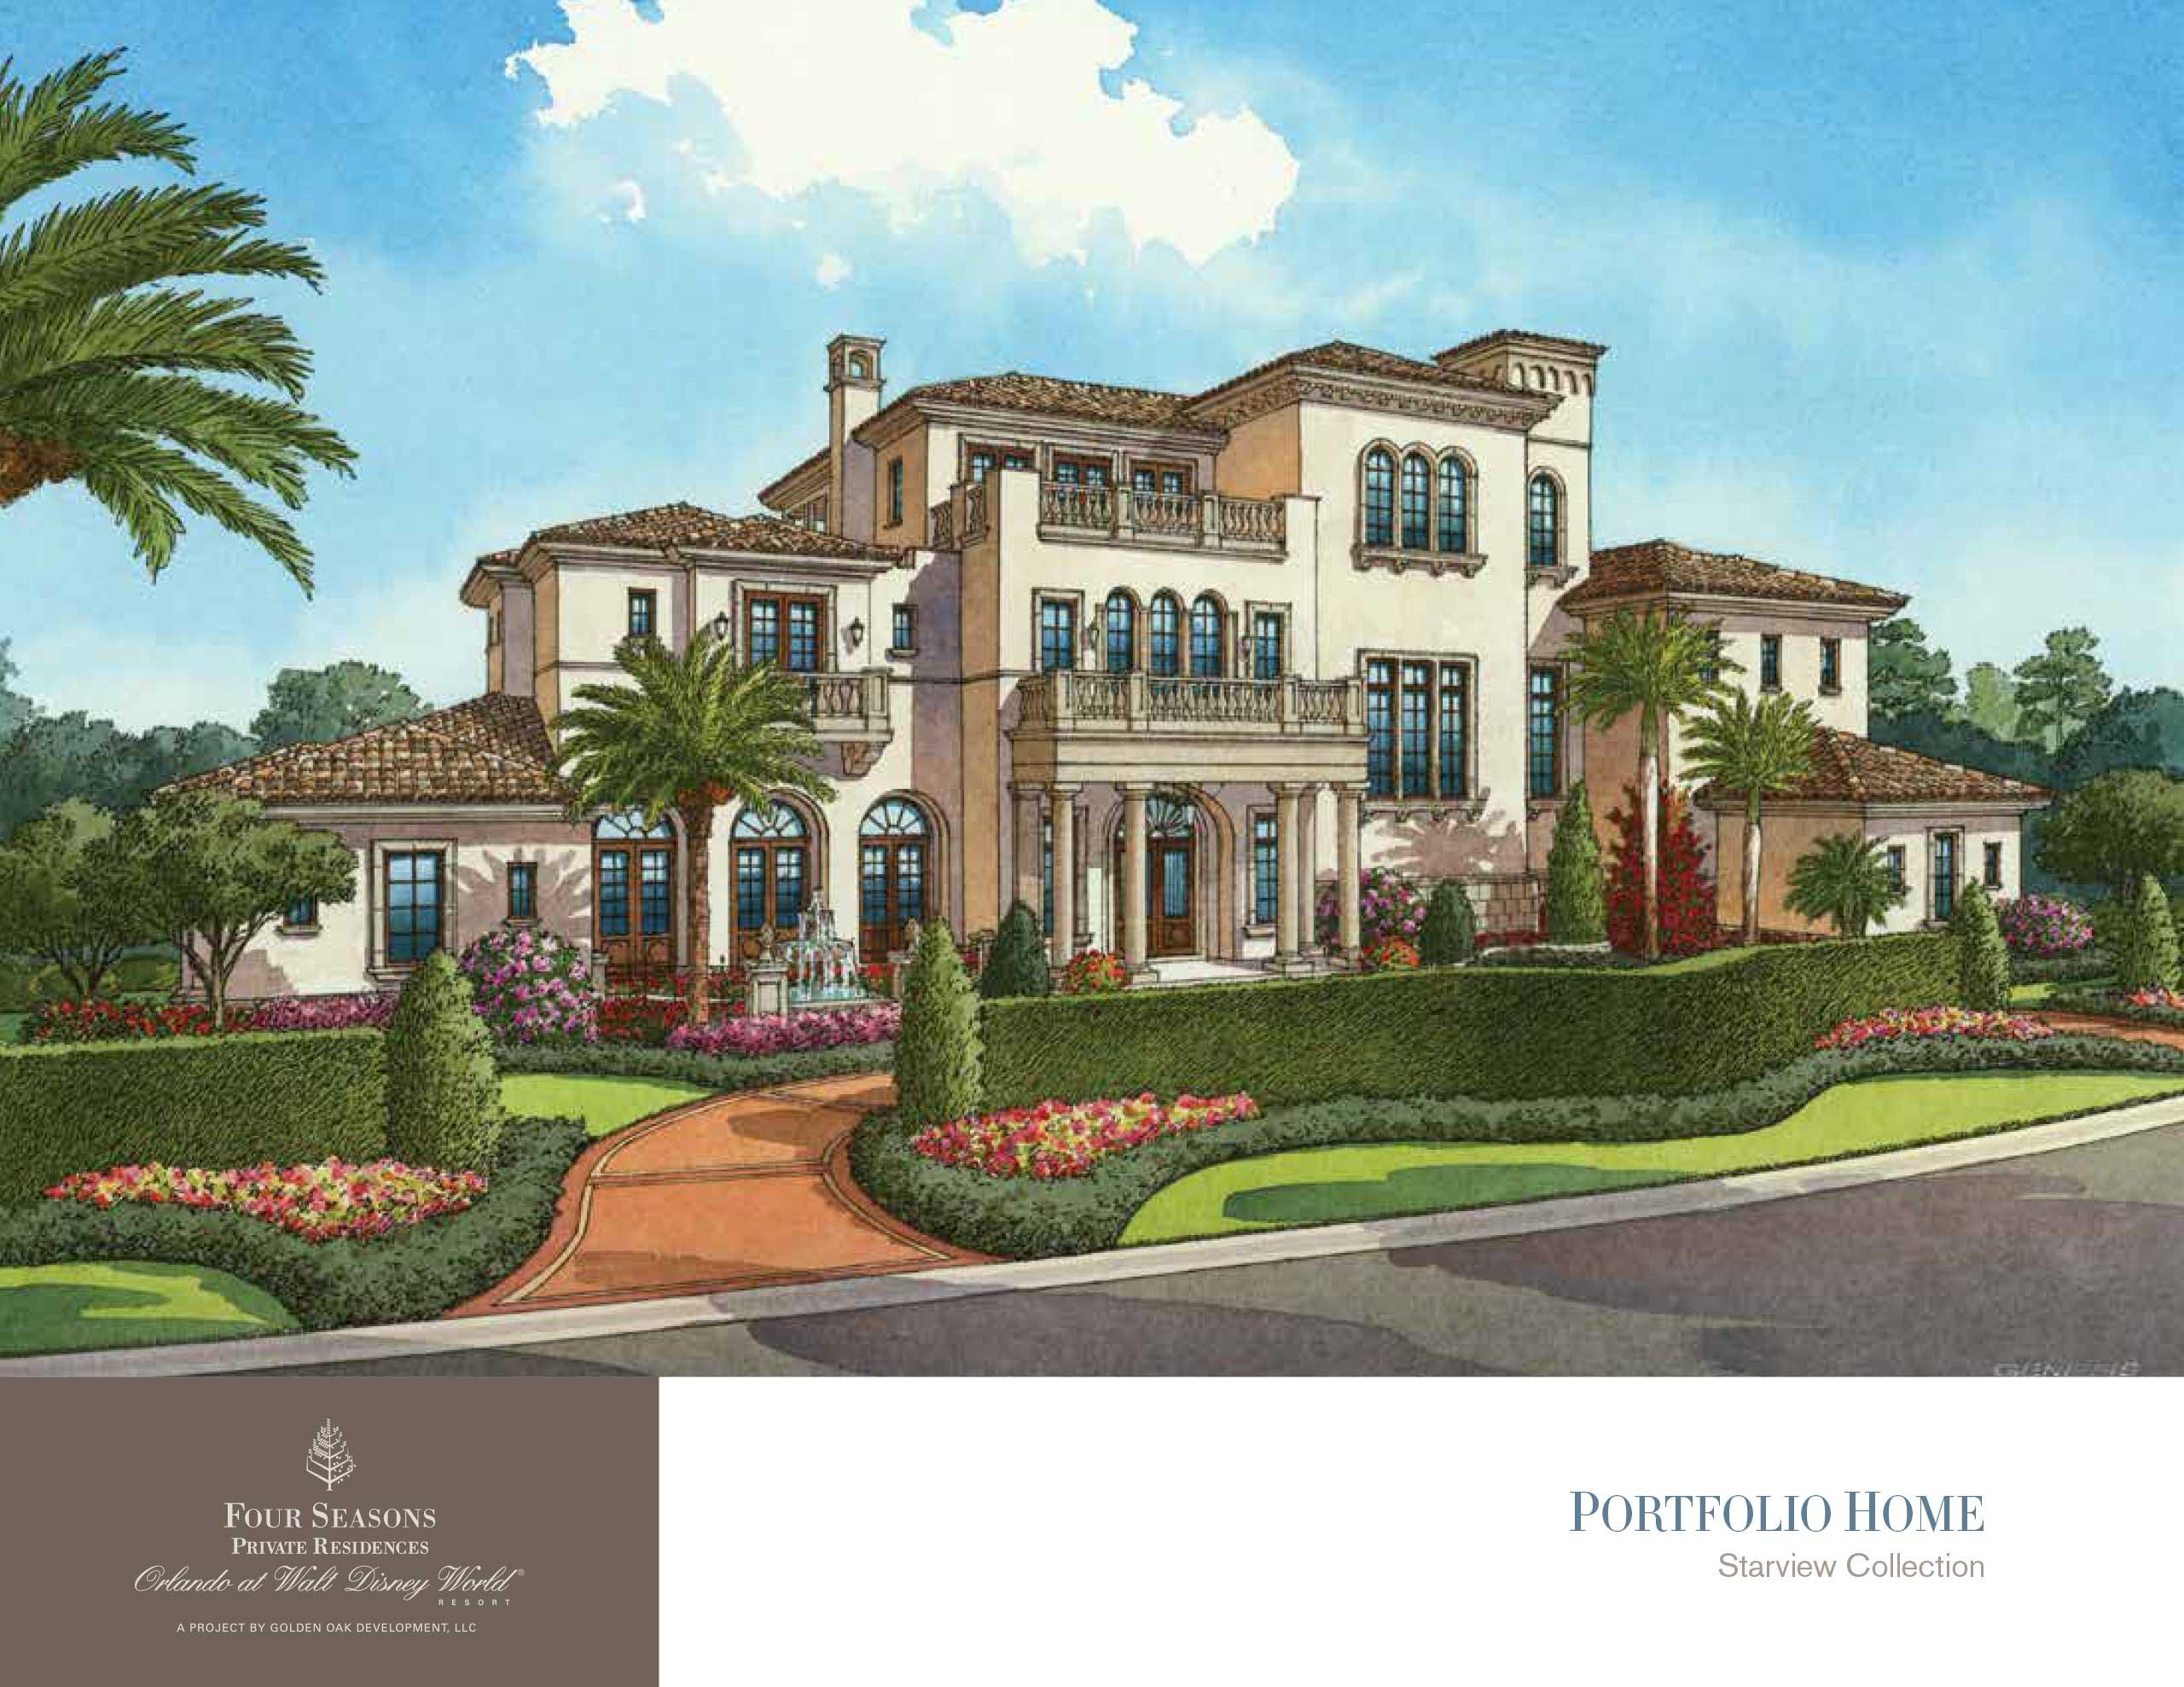 Four Seasons Private Residences Orlando at Walt Disney World